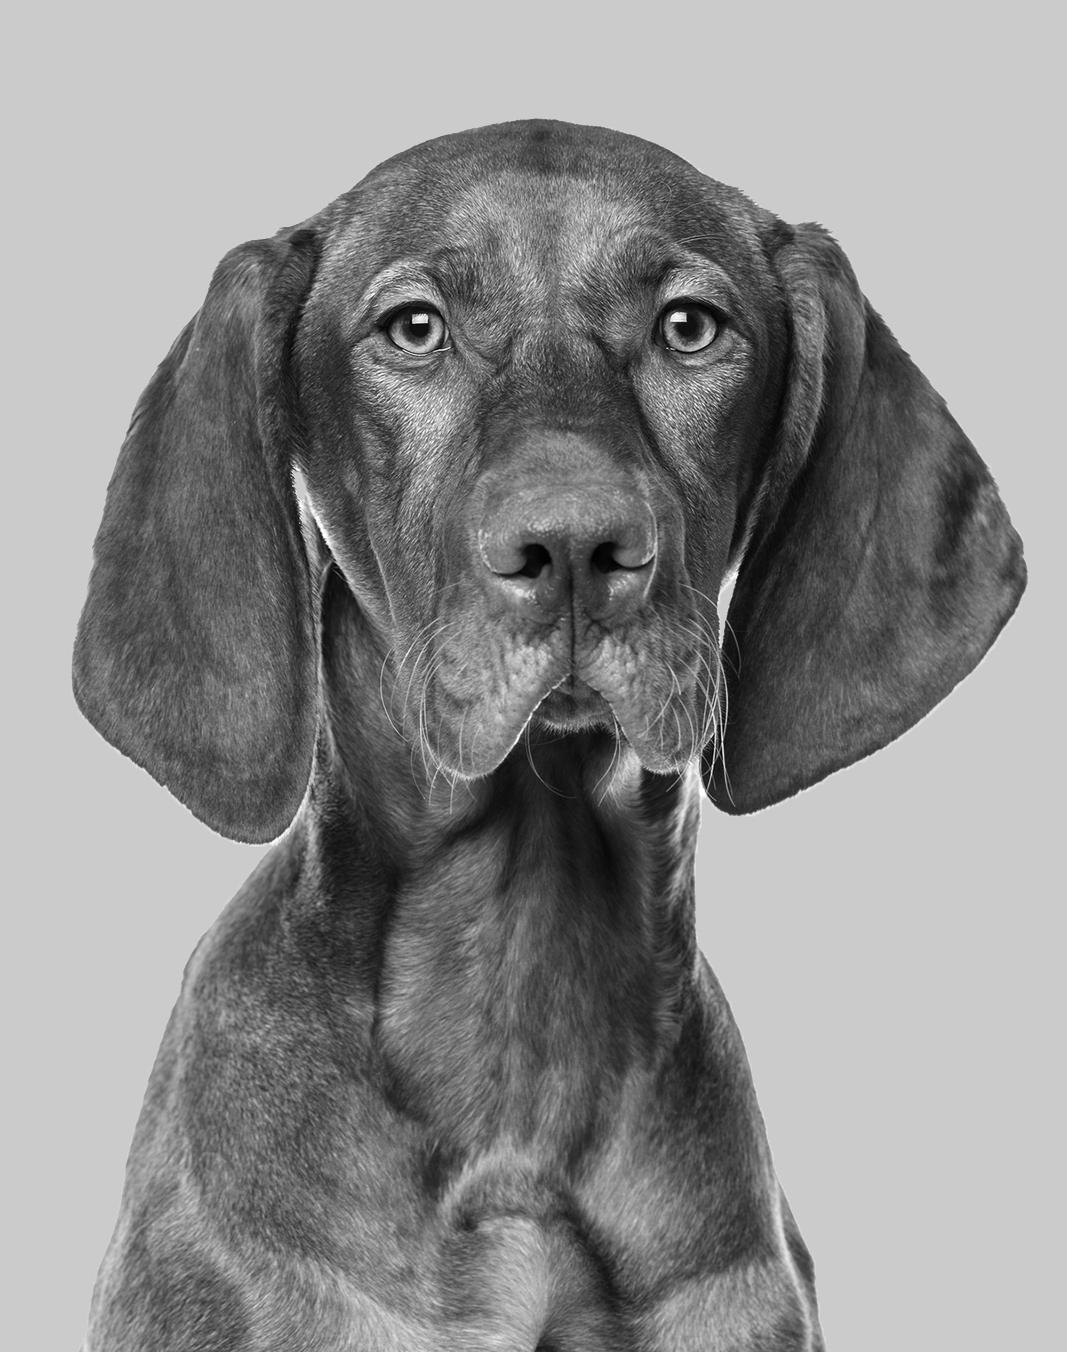 OKC dog grooming  dog salon okc  dog grooming education  school for dog grooming  training for dog grooming  grooming school  oklahoma dog grooming  oklahoma grooming school  dog grooming  oklahoma city dog salon  oklahoma city dog groomer  dog groomer okc  dog grooming school